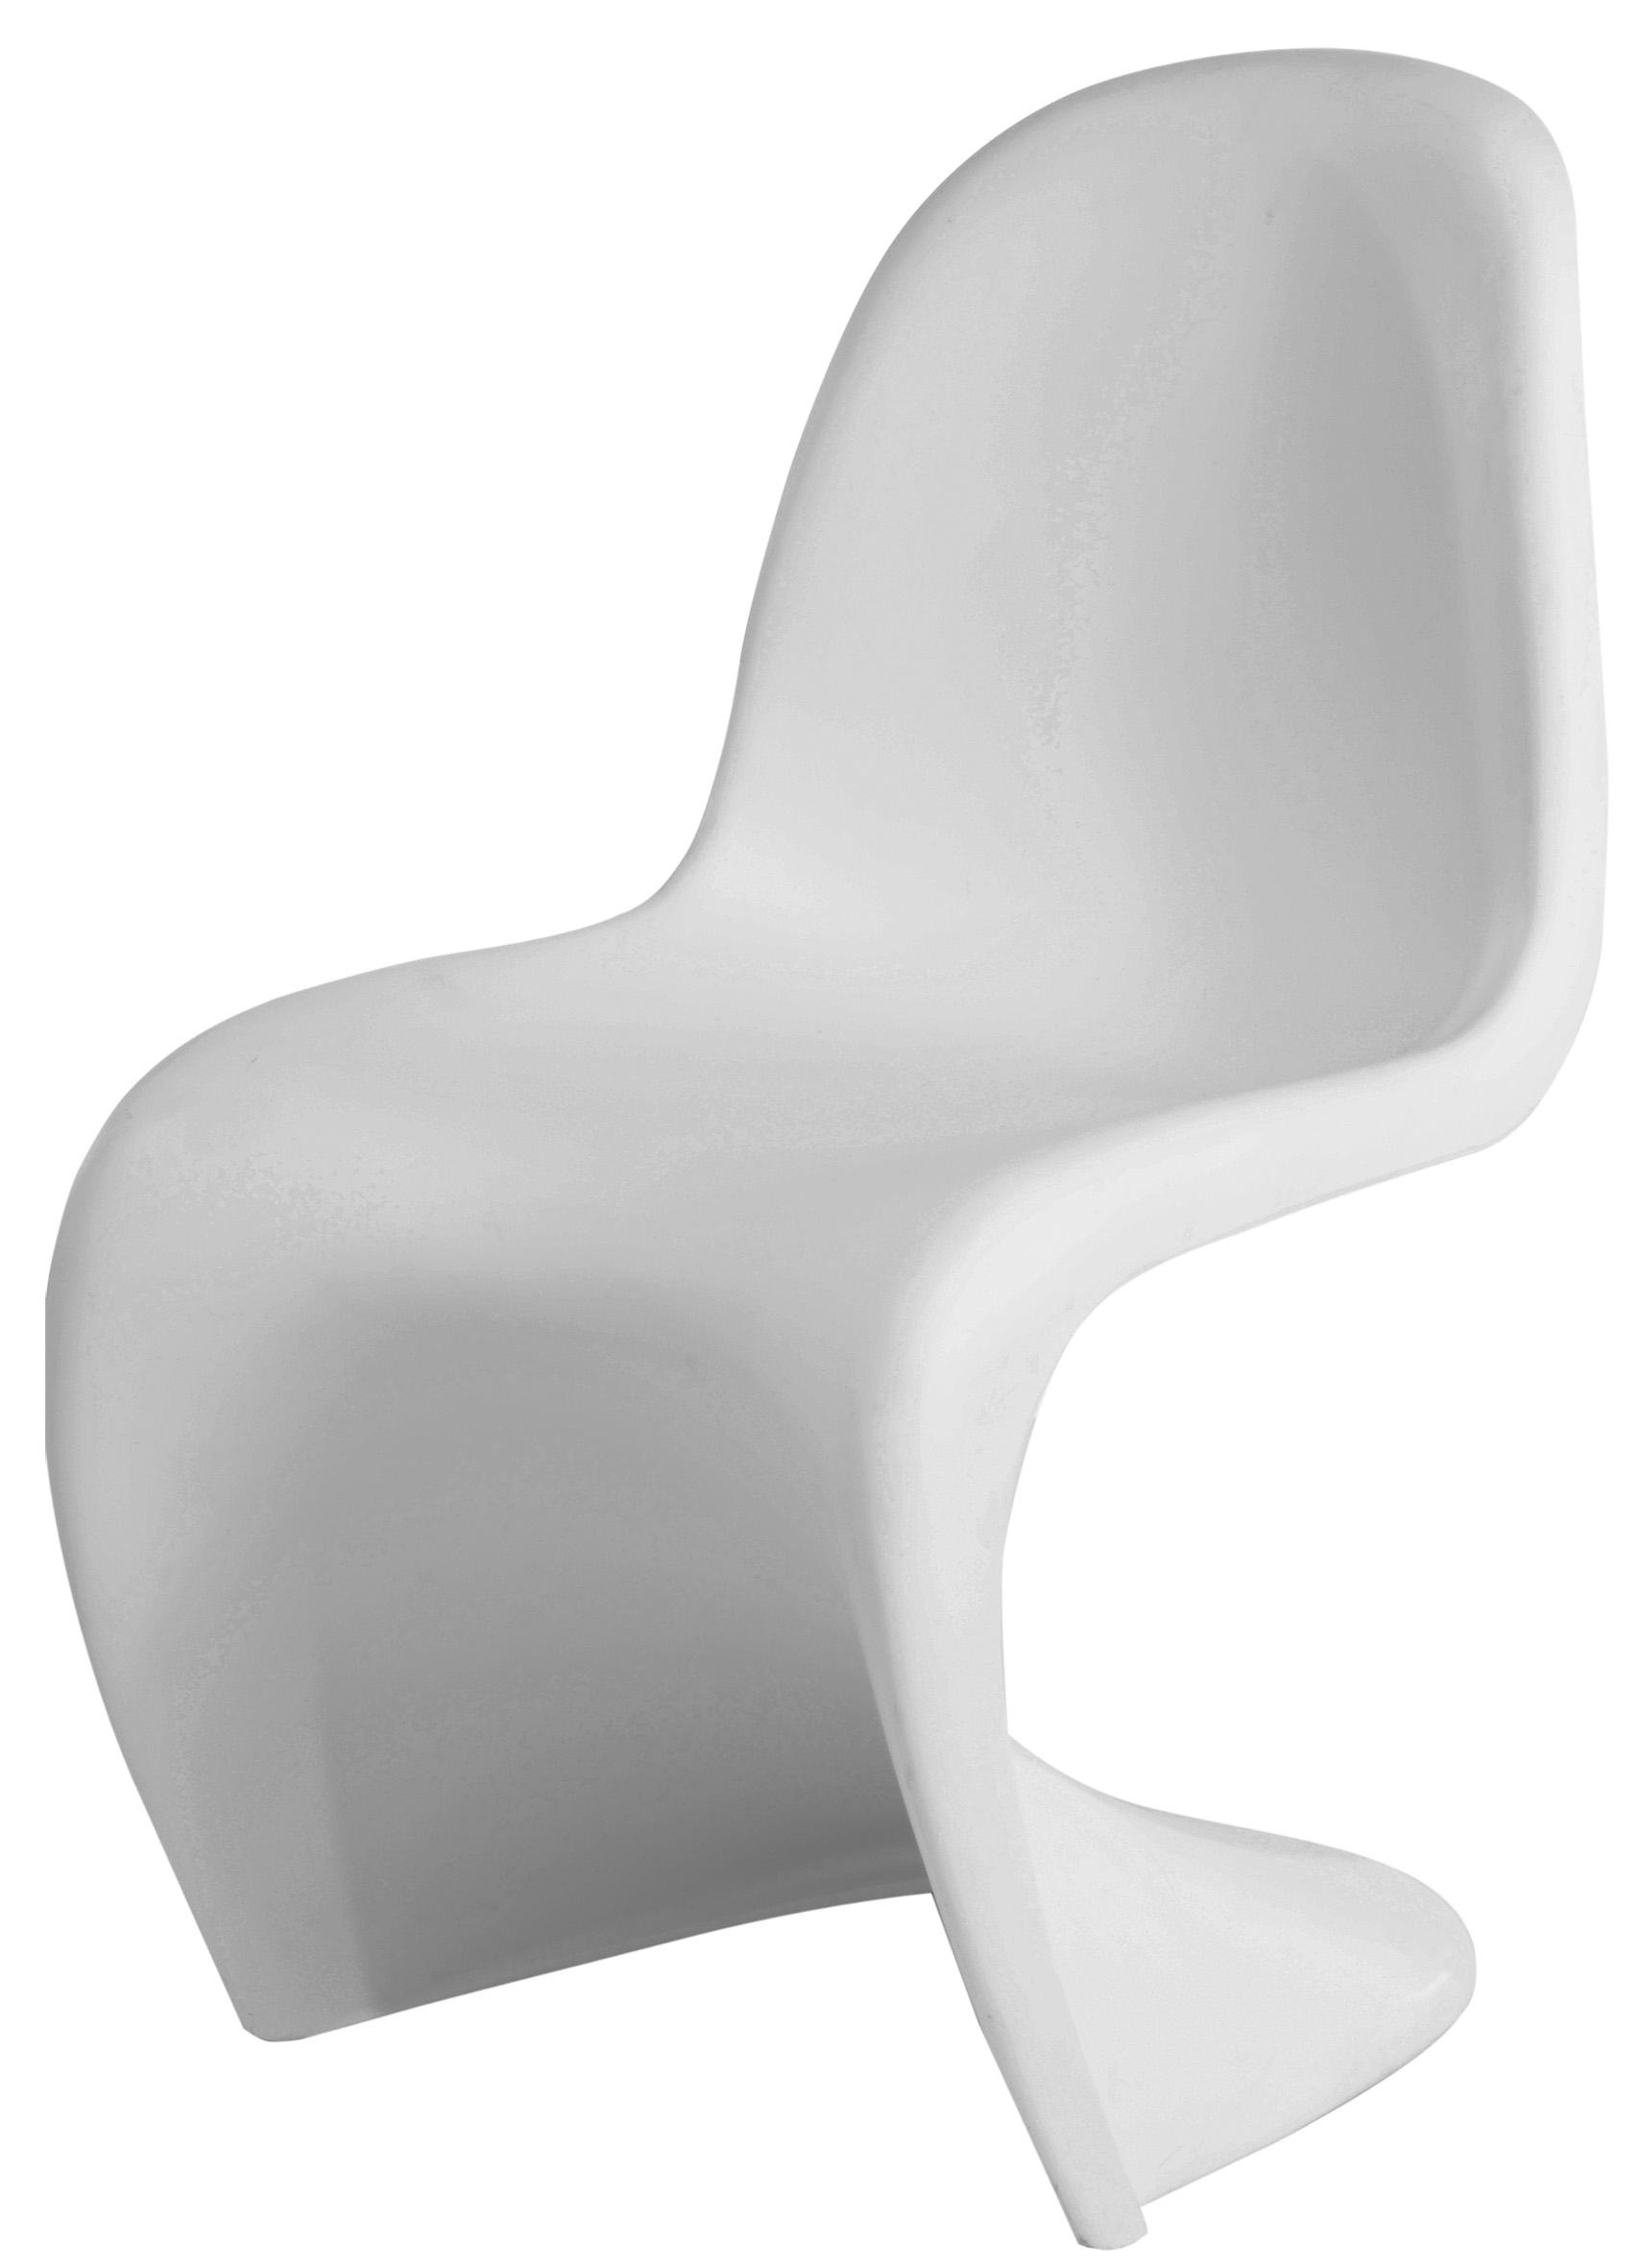 Panton-Stuhl: Freischwinger / Designer-Stühle (Vitra, Verner Panton)